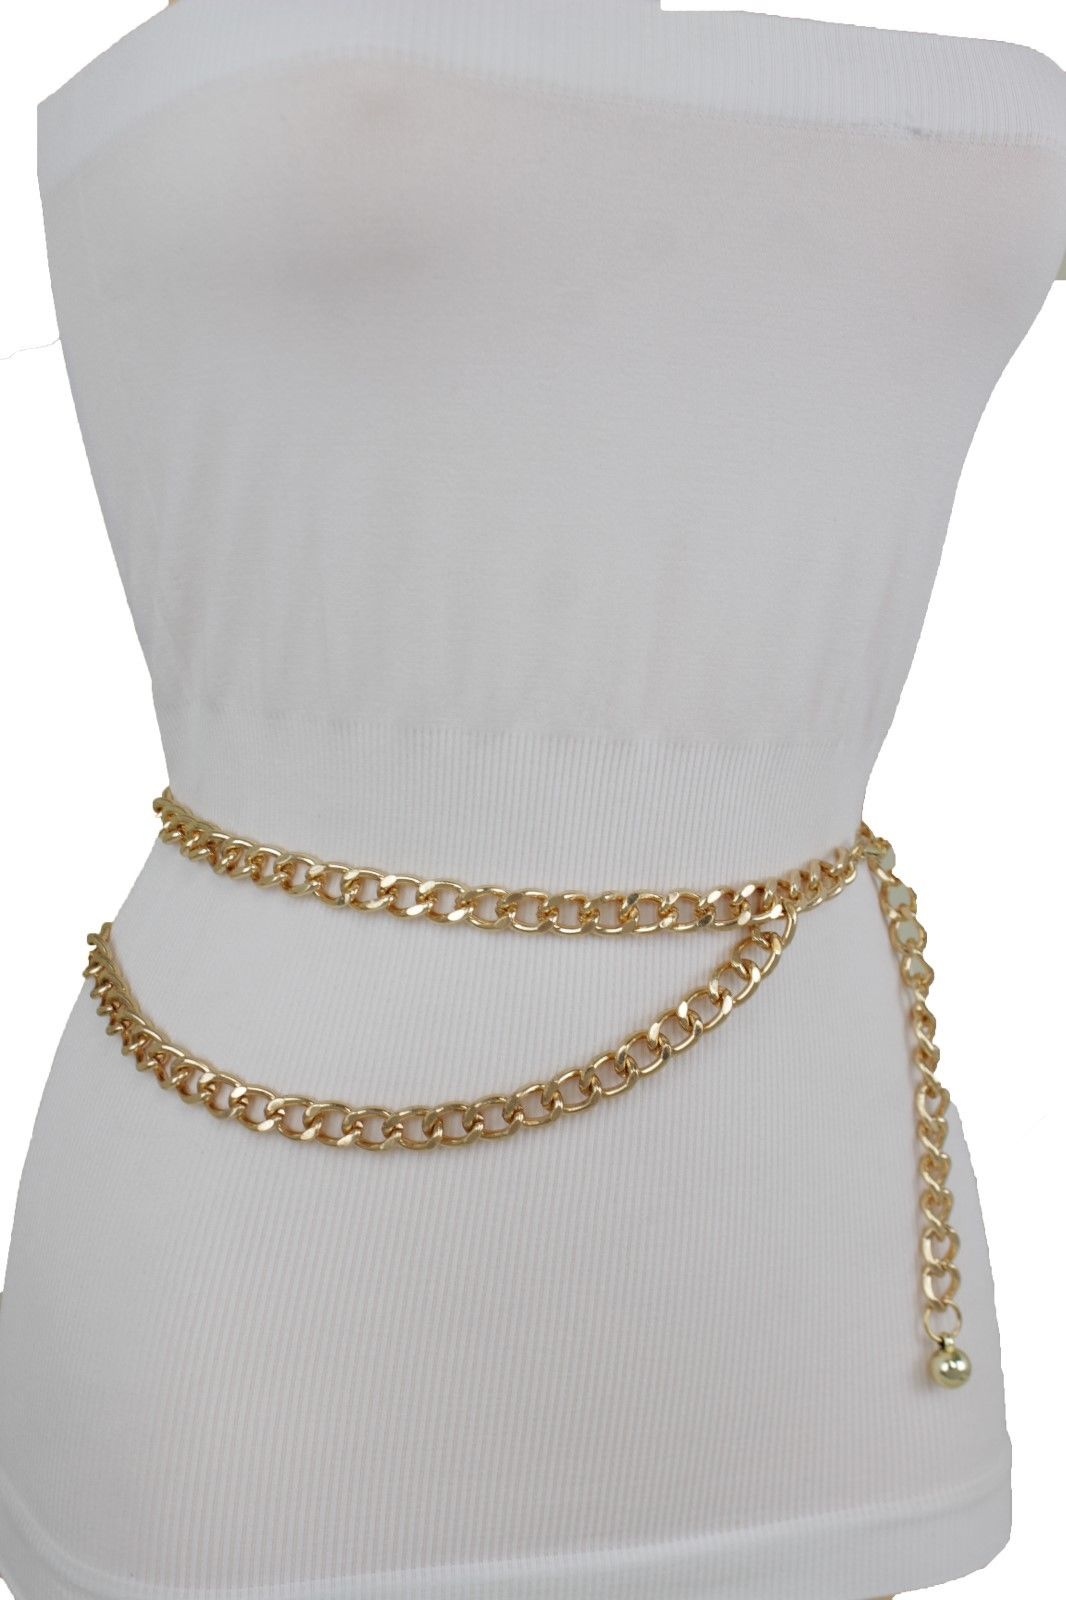 Women Fashion Belt Hip High Waist Gold Metal Long Sun Smile Charm Buckle XS S M